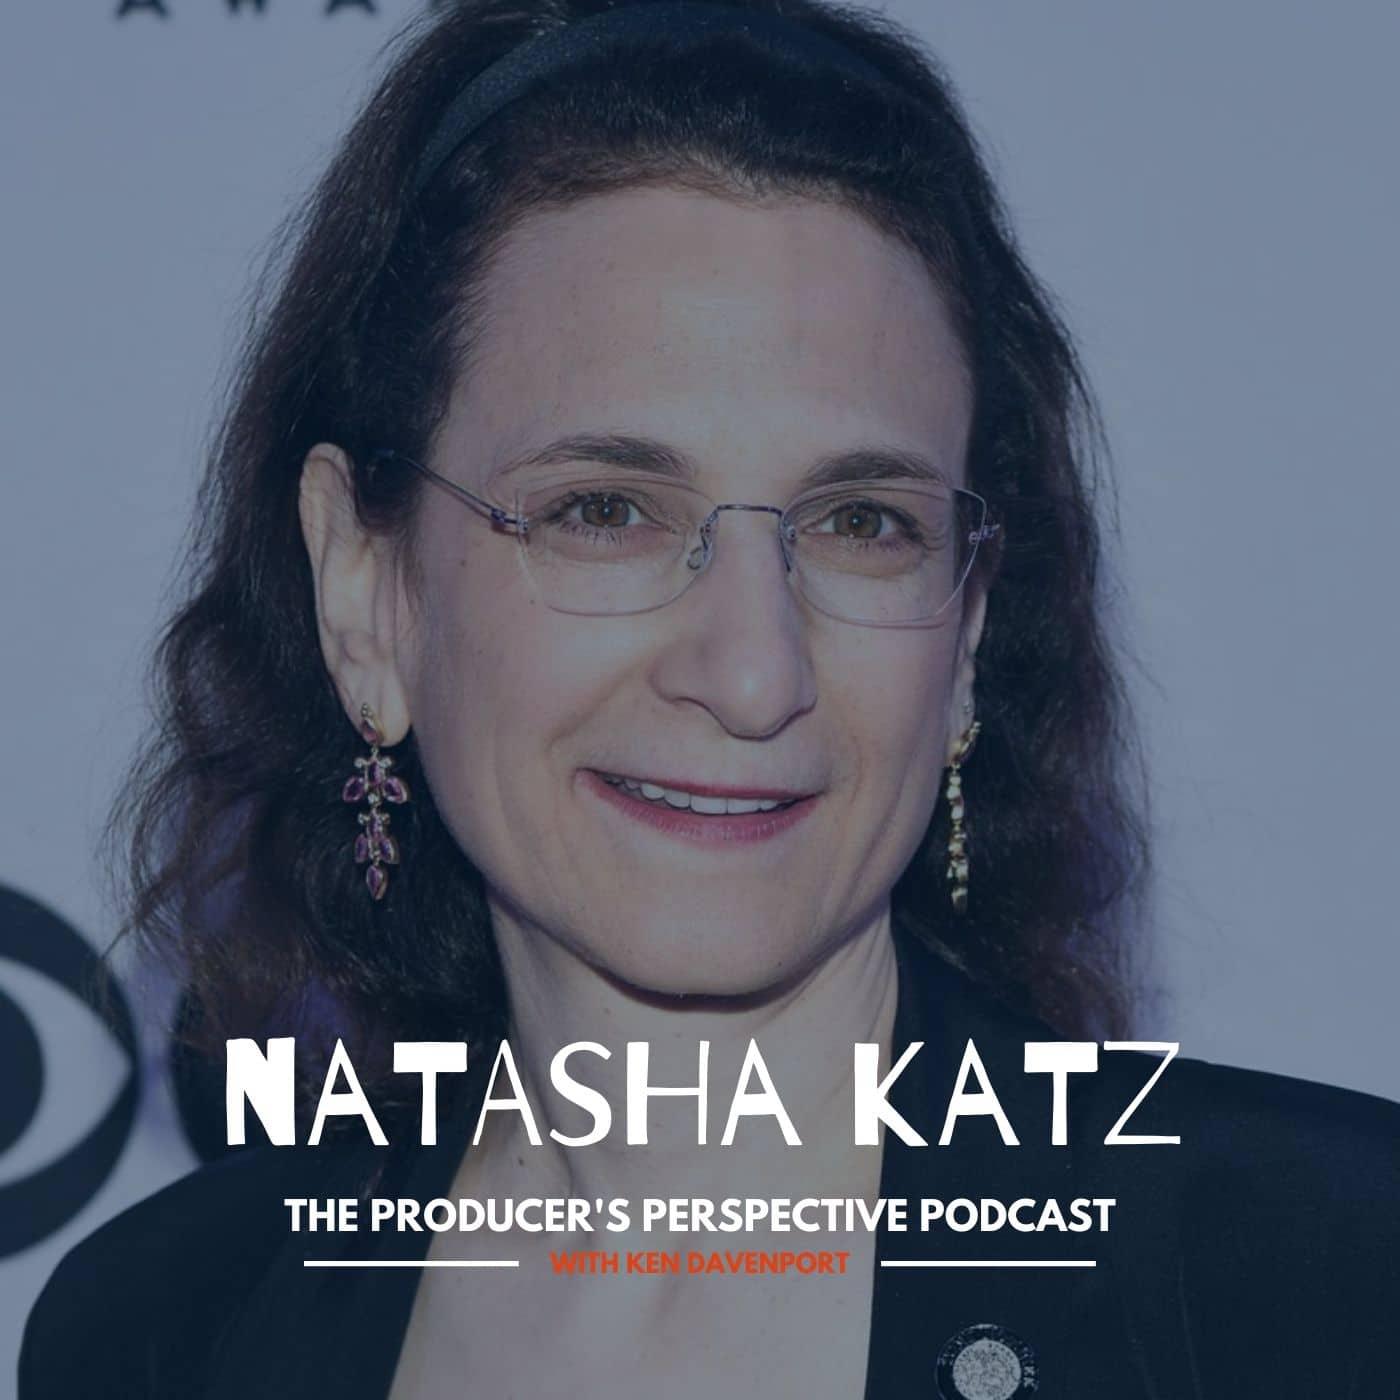 Ken Davenport's The Producer's Perspective Podcast Episode 106 - Natasha Katz